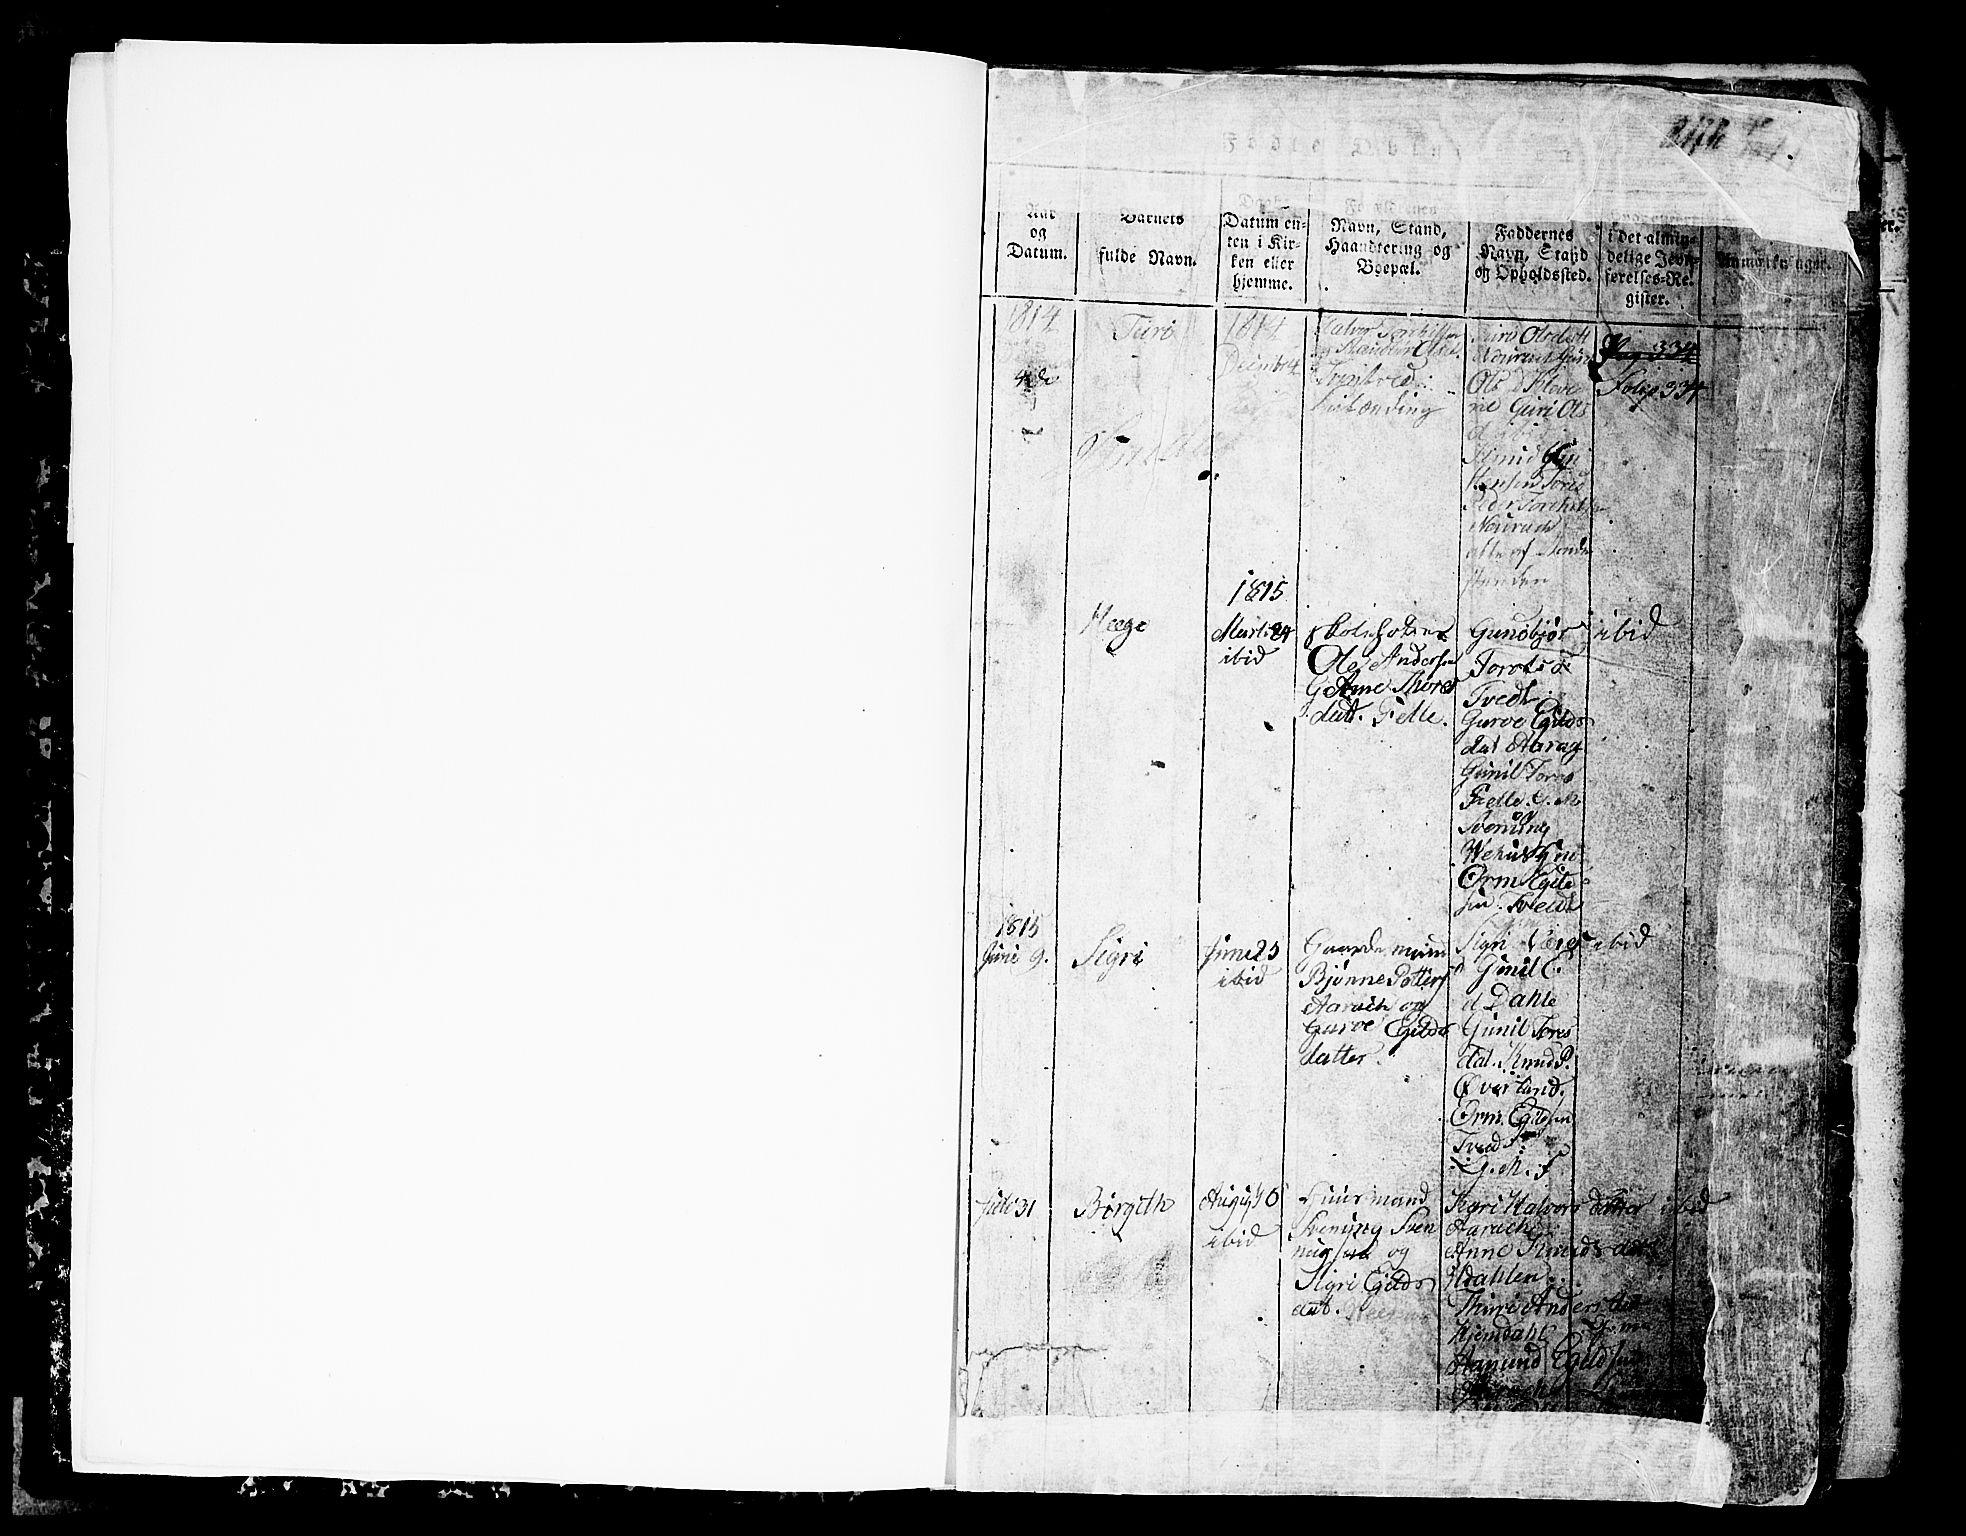 SAKO, Nissedal kirkebøker, G/Gb/L0001: Klokkerbok nr. II 1, 1814-1862, s. 1